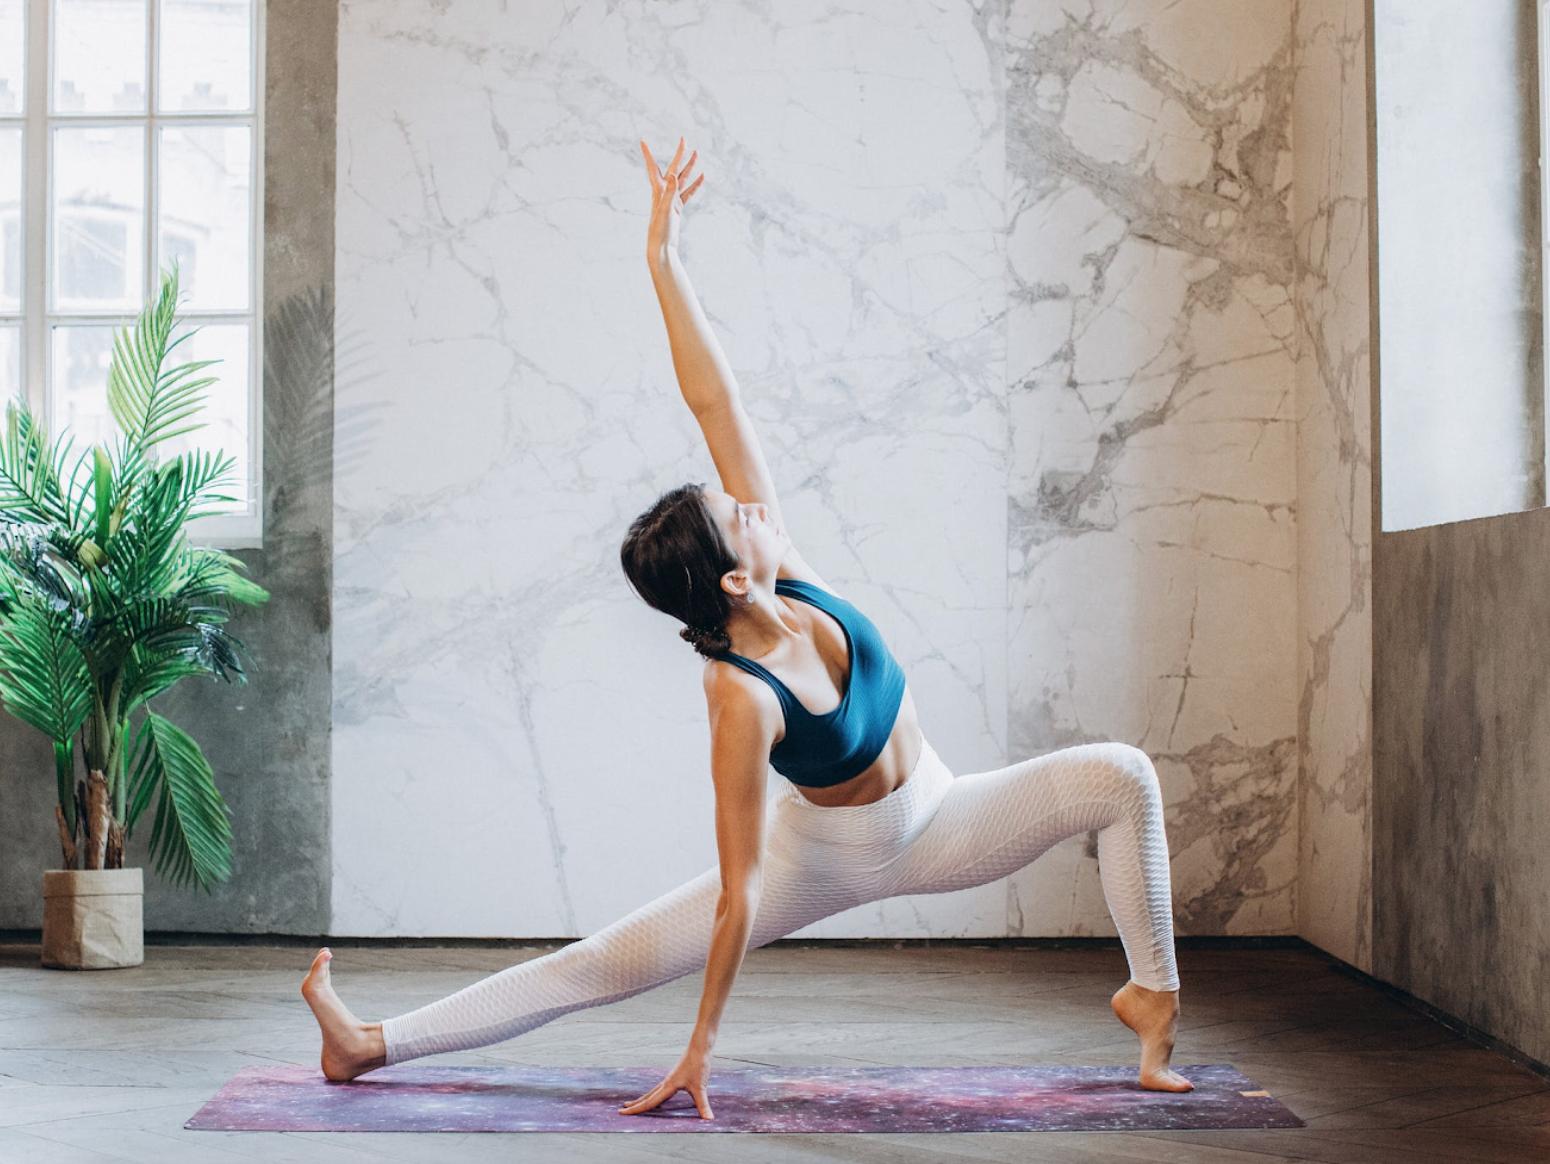 A woman practices anusara yoga.